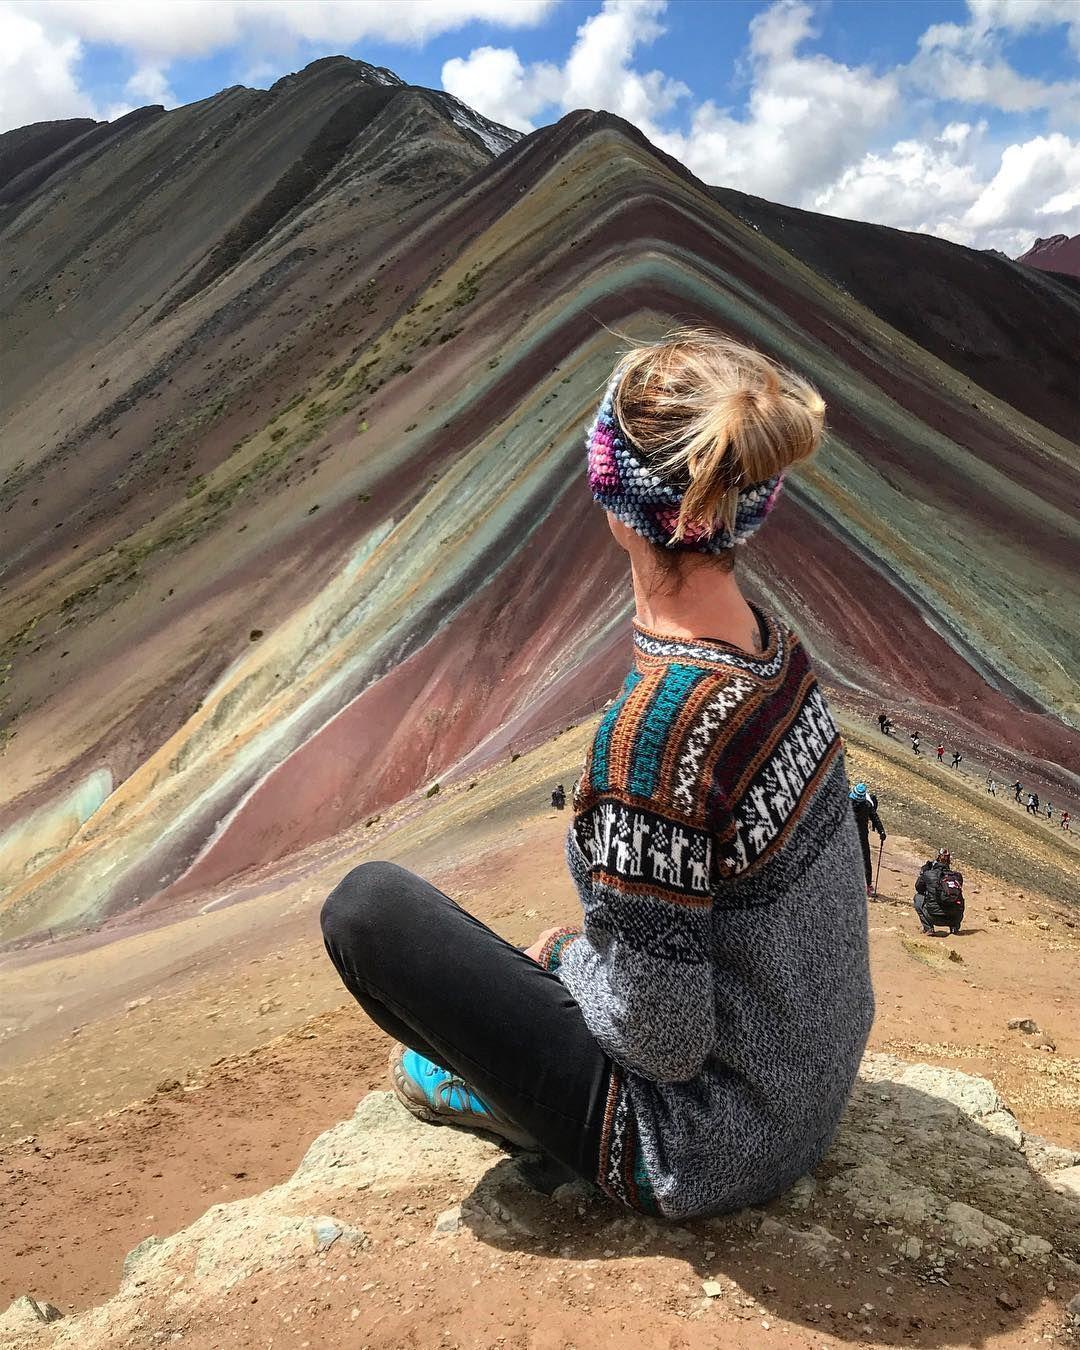 Jacqui Q On Instagram Rainbow Mountain Hike Peru 5000m Altitude Above Sea Level Everest Base Camp Is 540 Mountain Hiking Rainbow Mountain Peru Culture